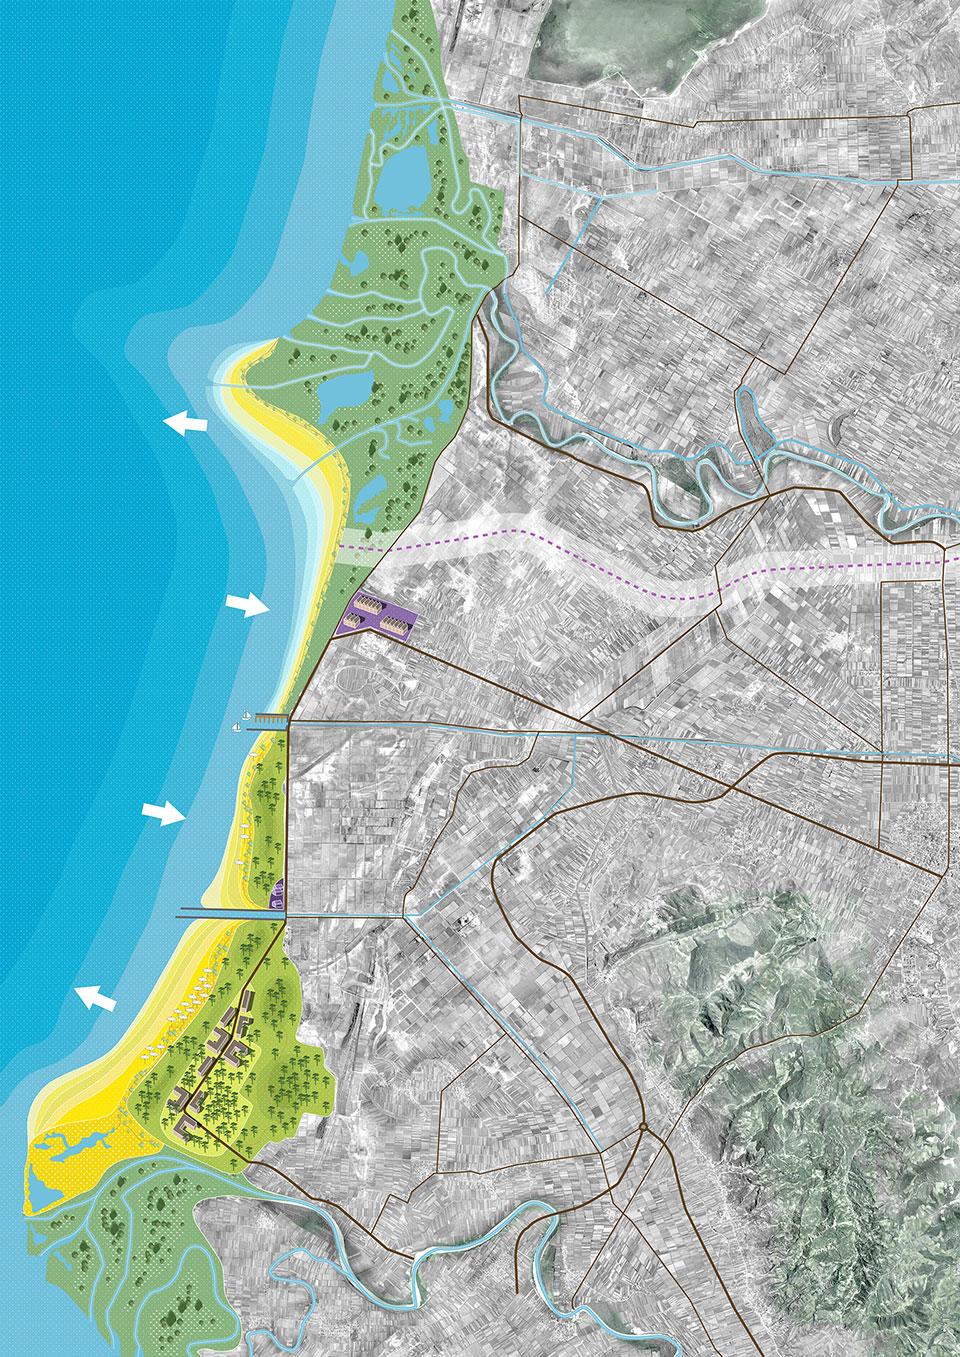 felixx-fier-basemap2.jpg